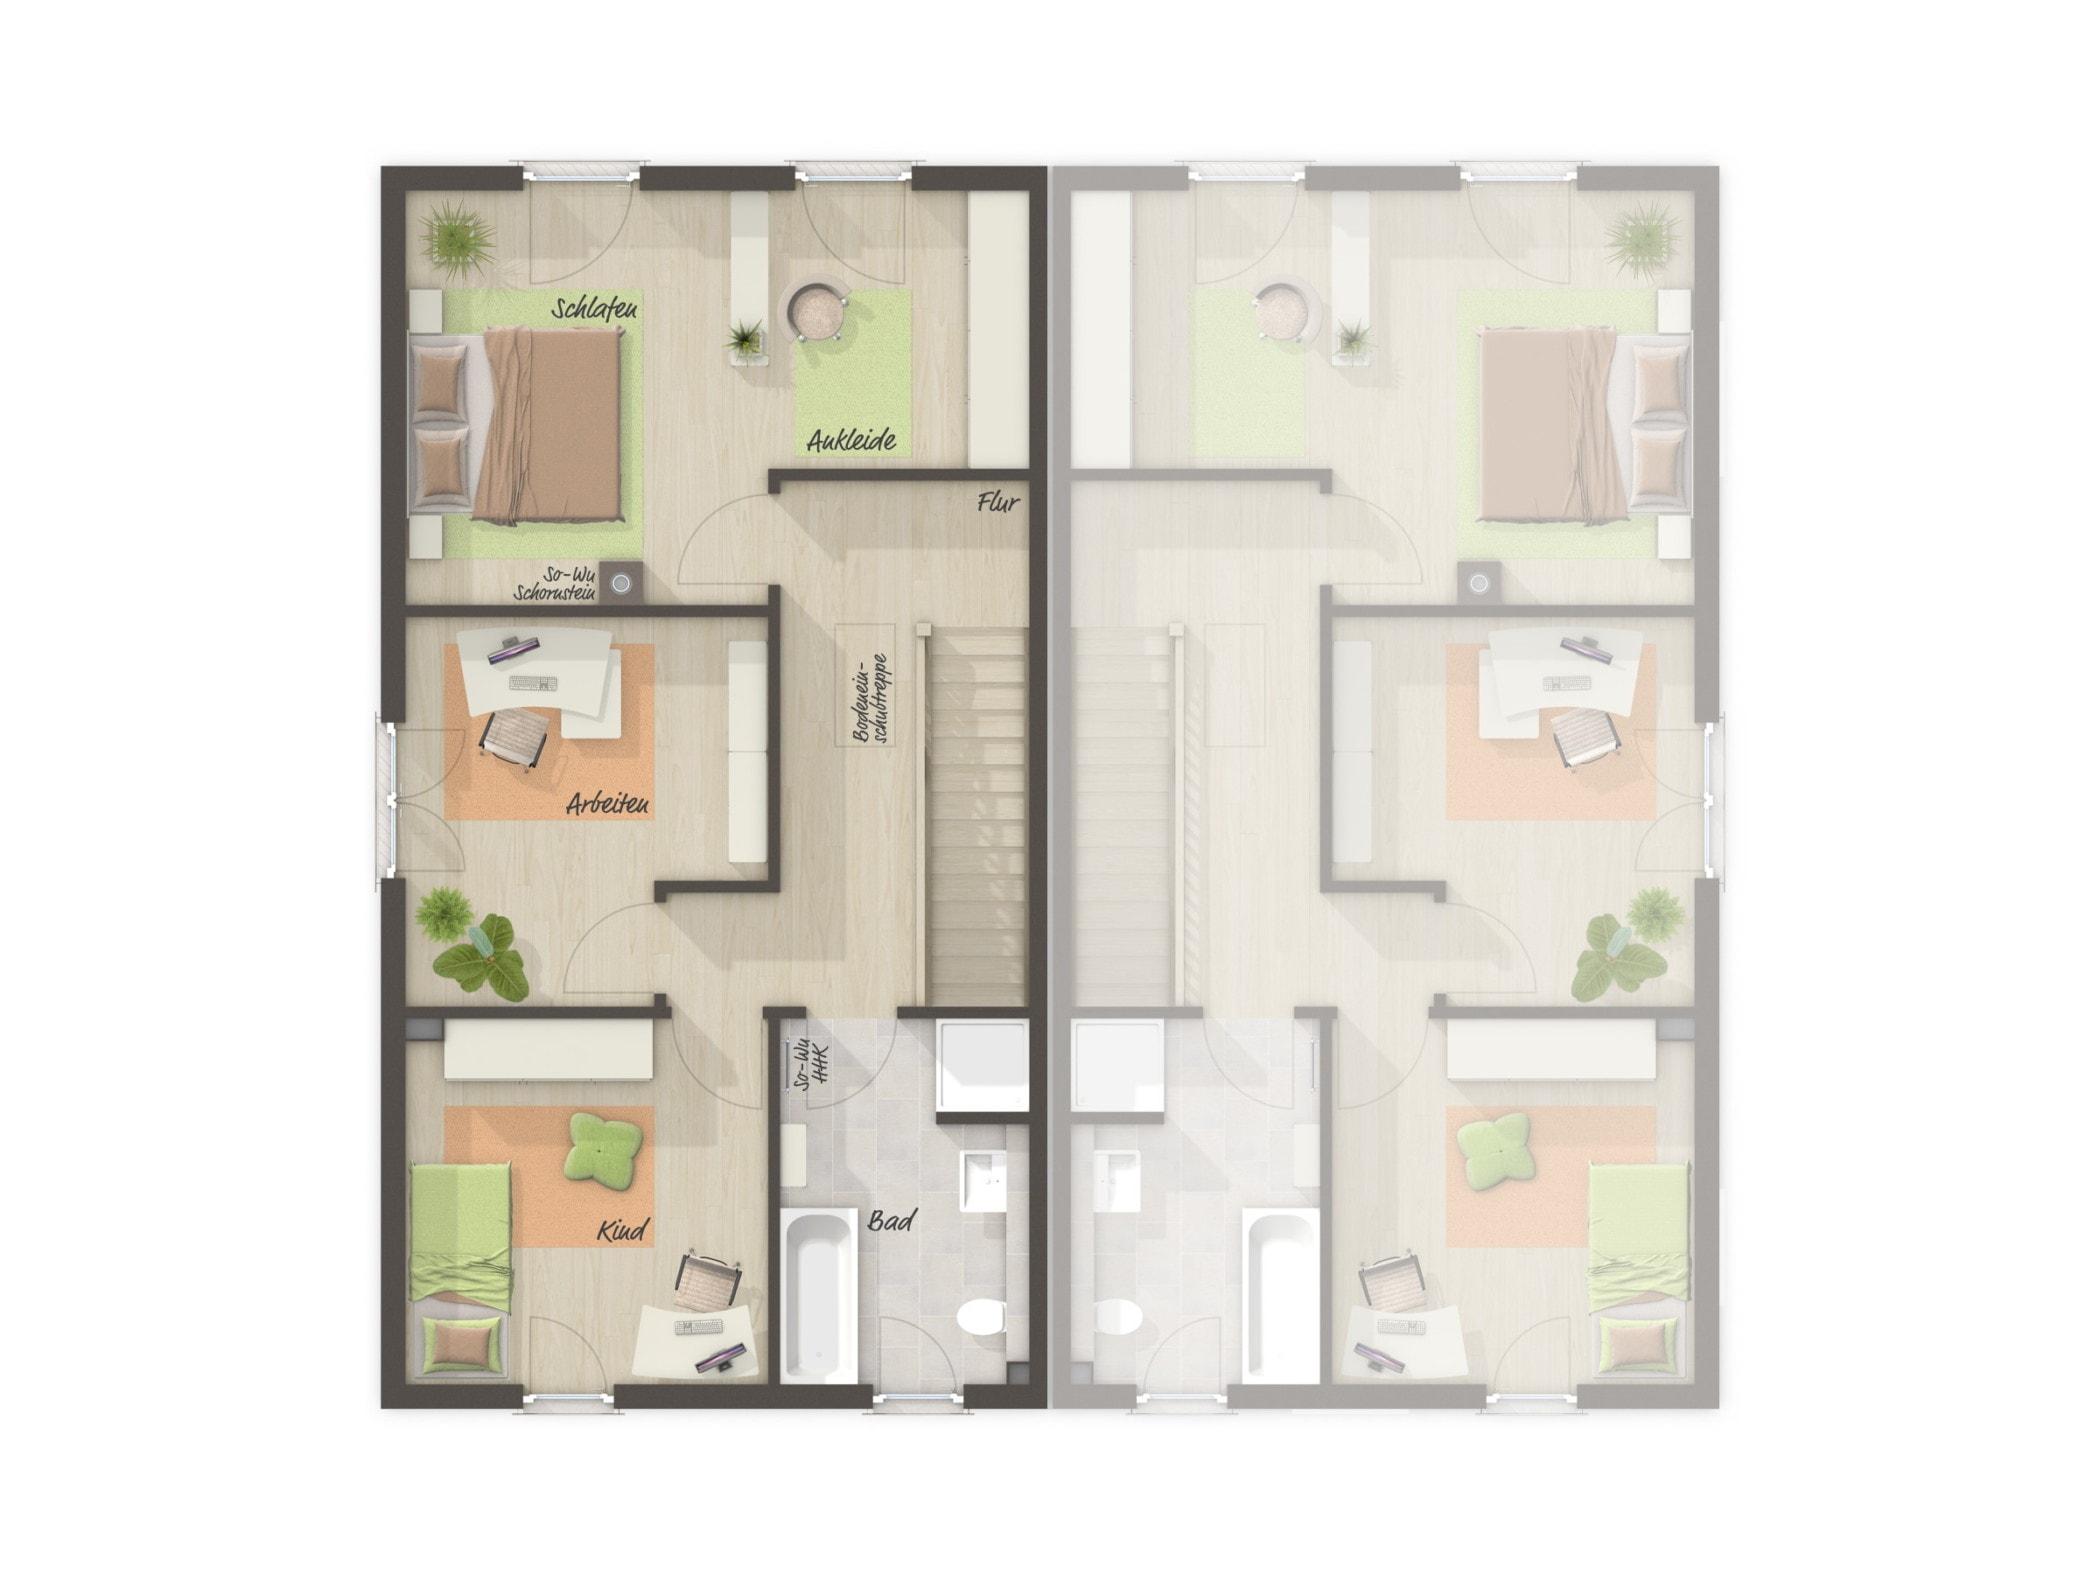 Doppelhaus Grundriss OG schmal mit Satteldach & gerade Treppe, 4 Zimmer, 125 qm - Massivhaus bauen Ideen Town Country Haus Aura 125 - HausbauDirekt.de